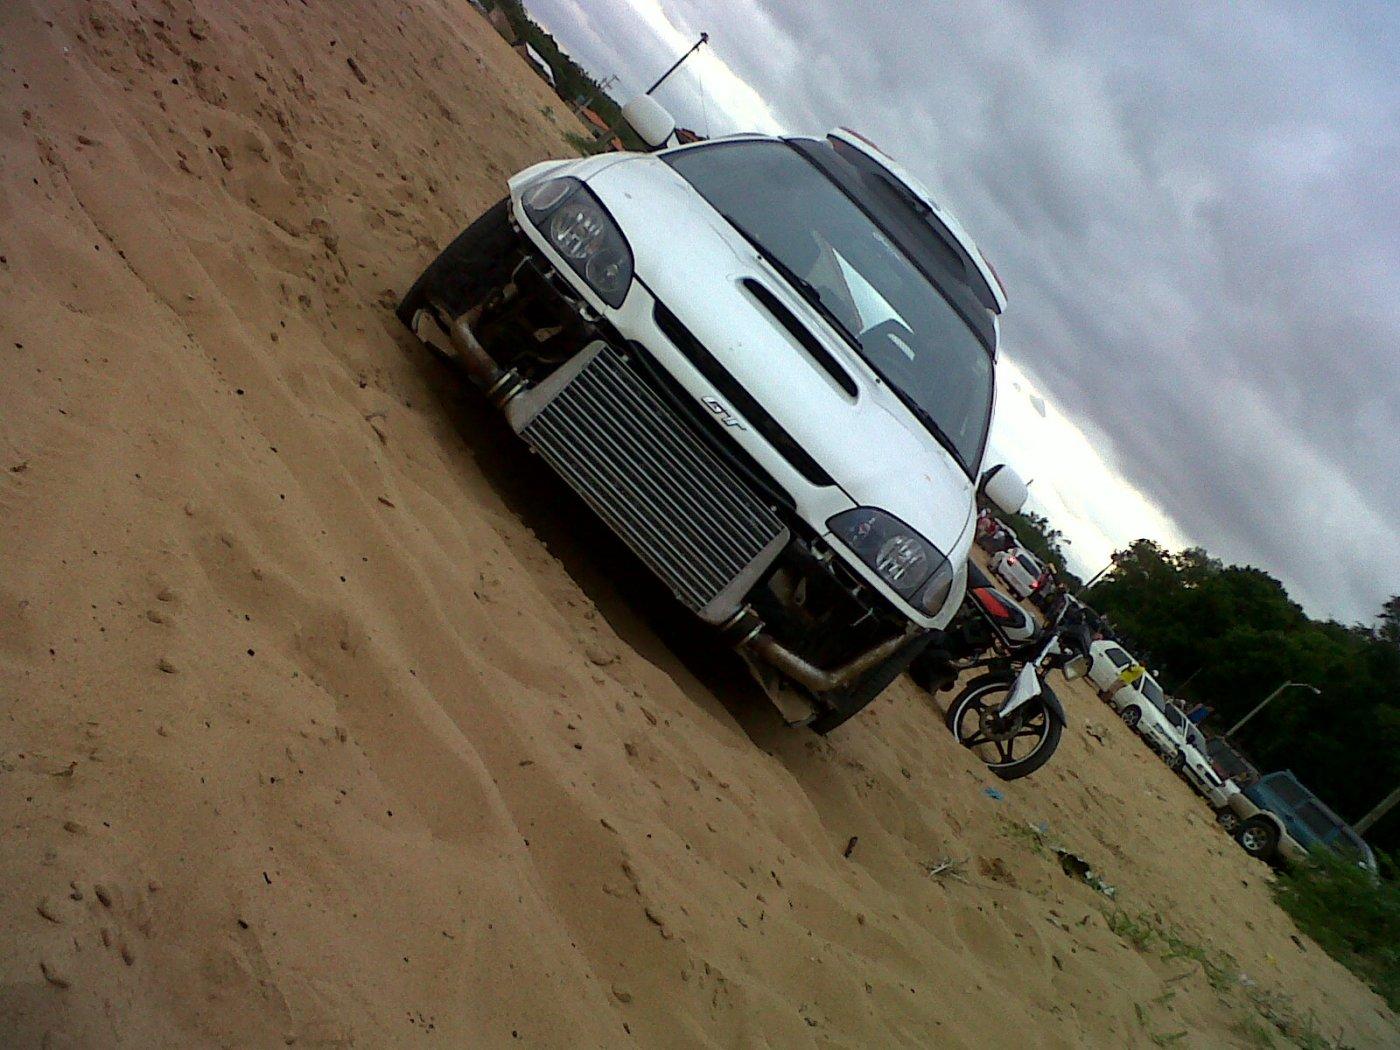 IMG00450-20121111-1845.jpg